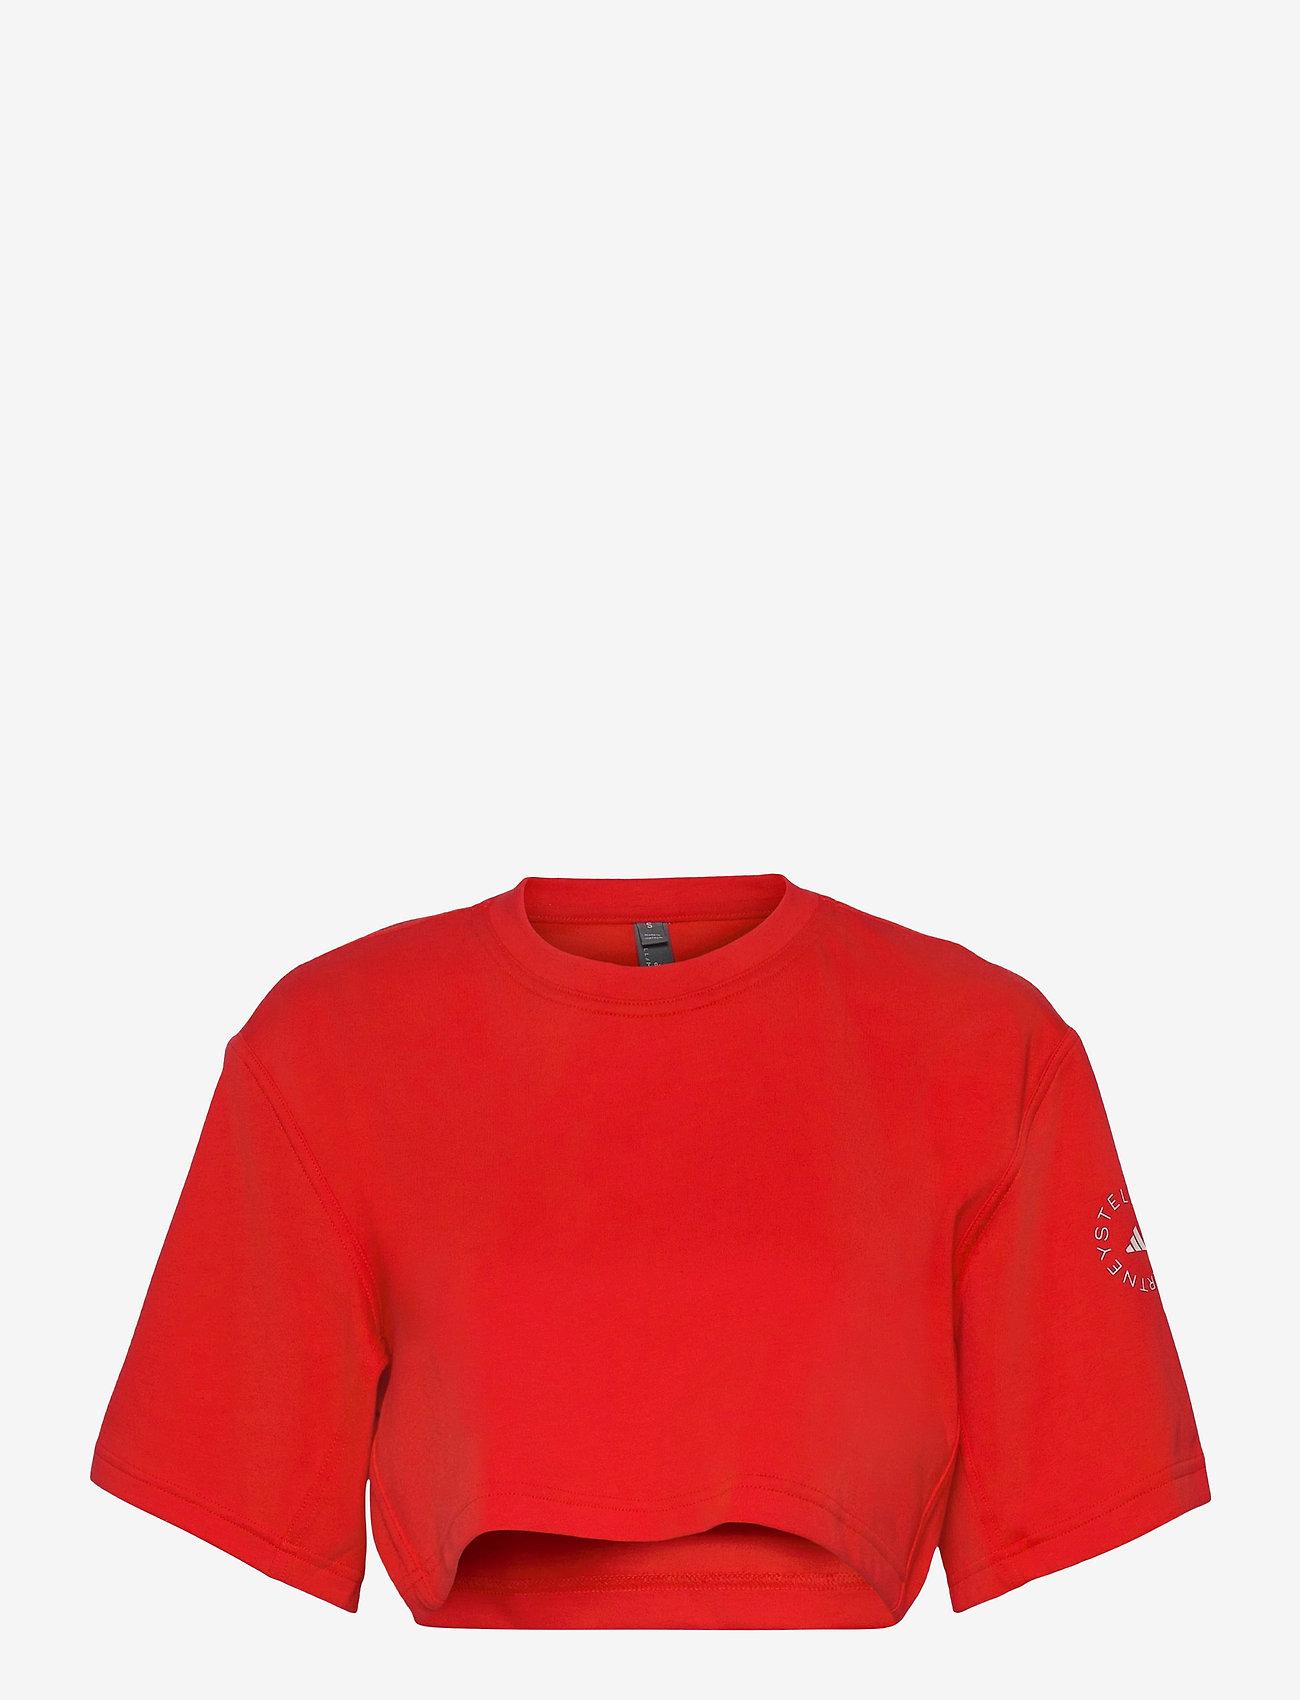 adidas by Stella McCartney - Future Playground Cropped T-Shirt W - tops & t-shirts - vivred - 1